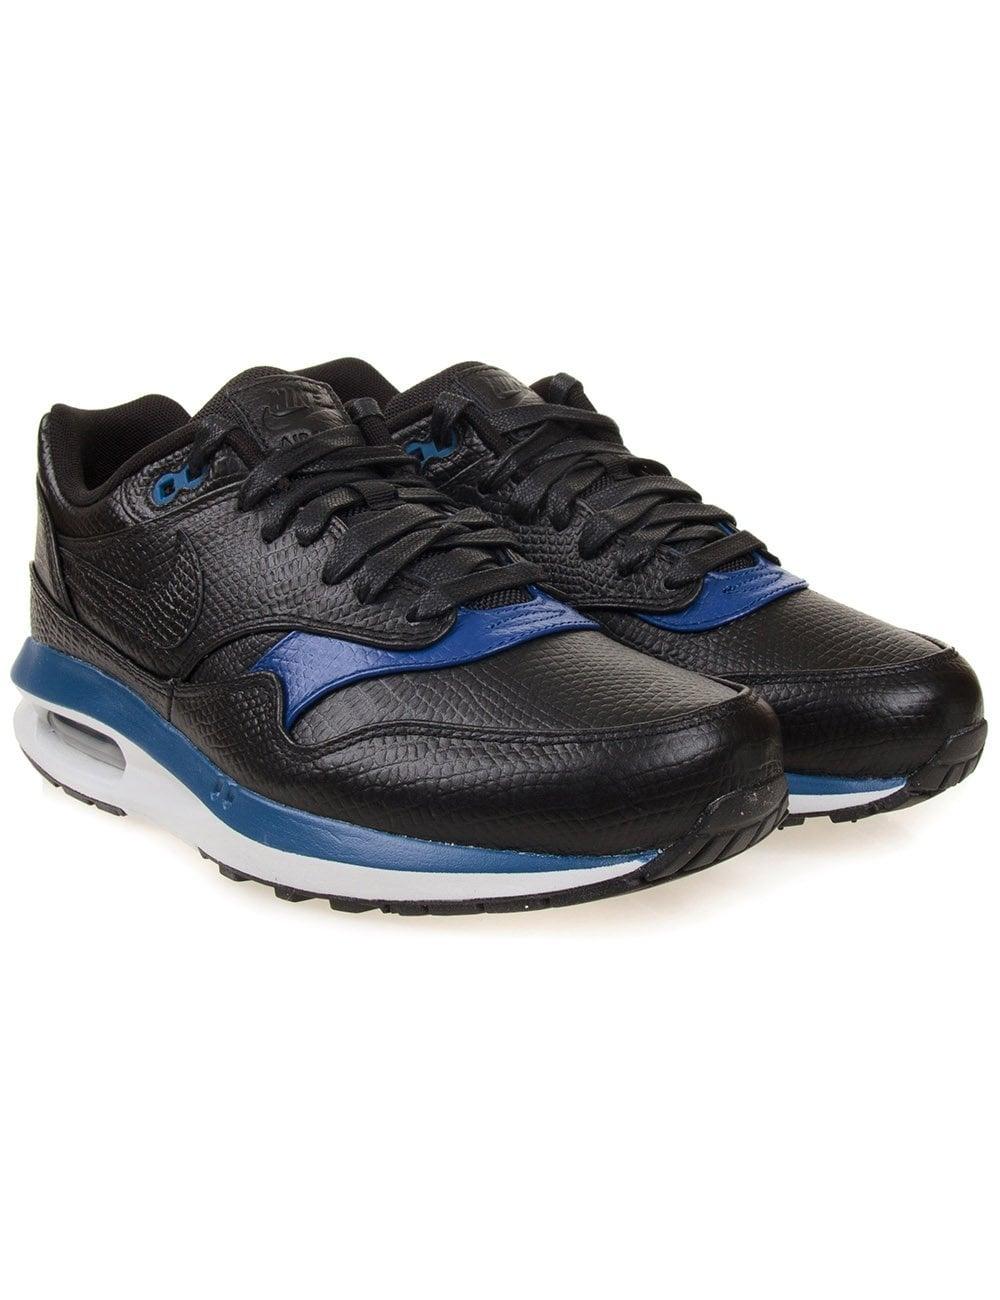 pretty nice 1e1f0 a7f26 Nike Air Max 1 Lunar Deluxe - Black